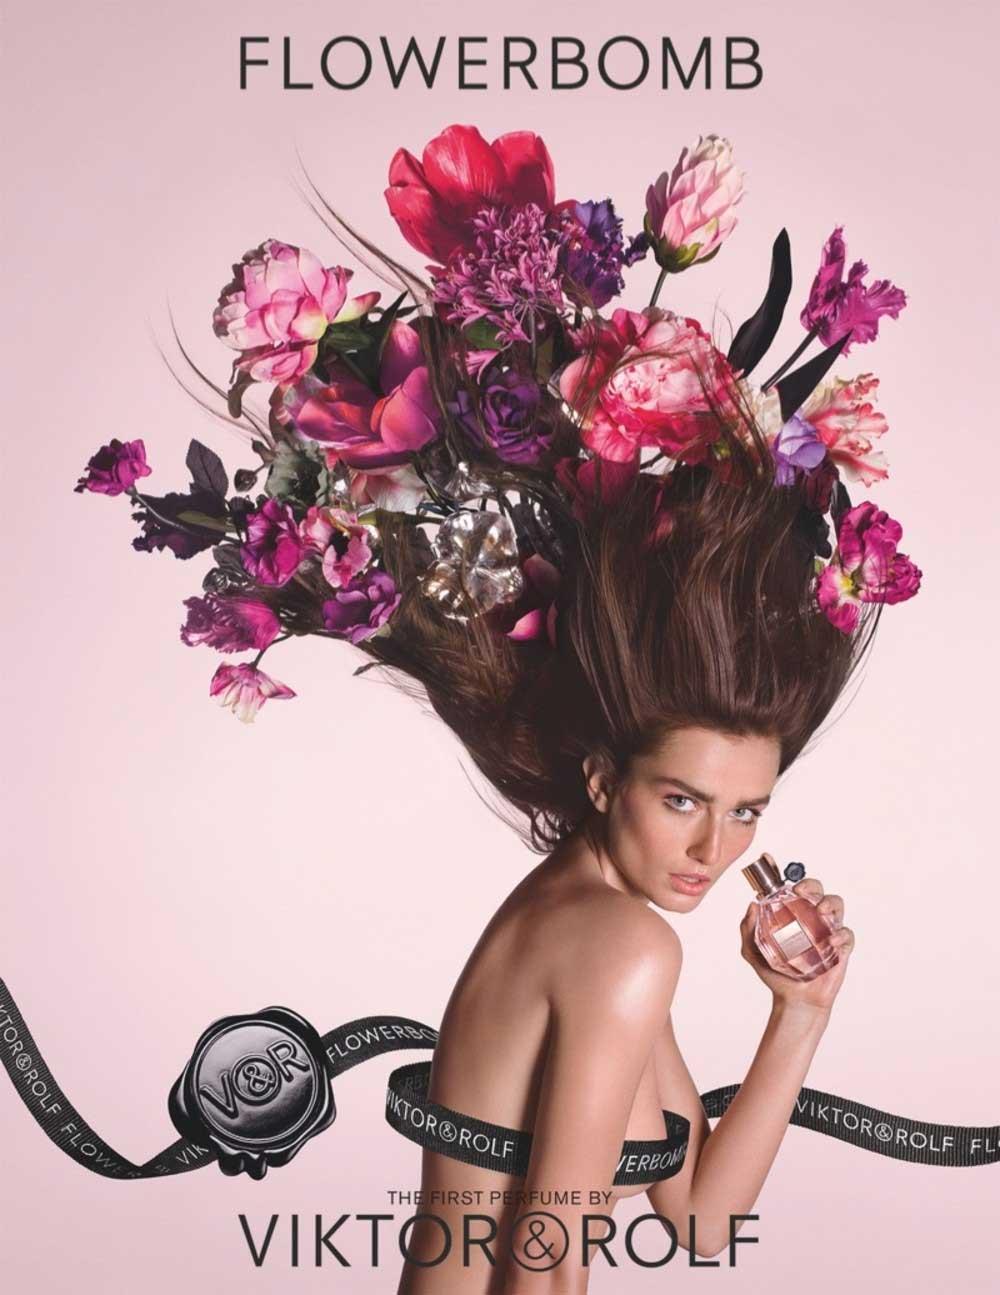 Viktor Rolf Fall 2016 Couture Fashion Show: Flowerbomb Viktor&Rolf Perfume